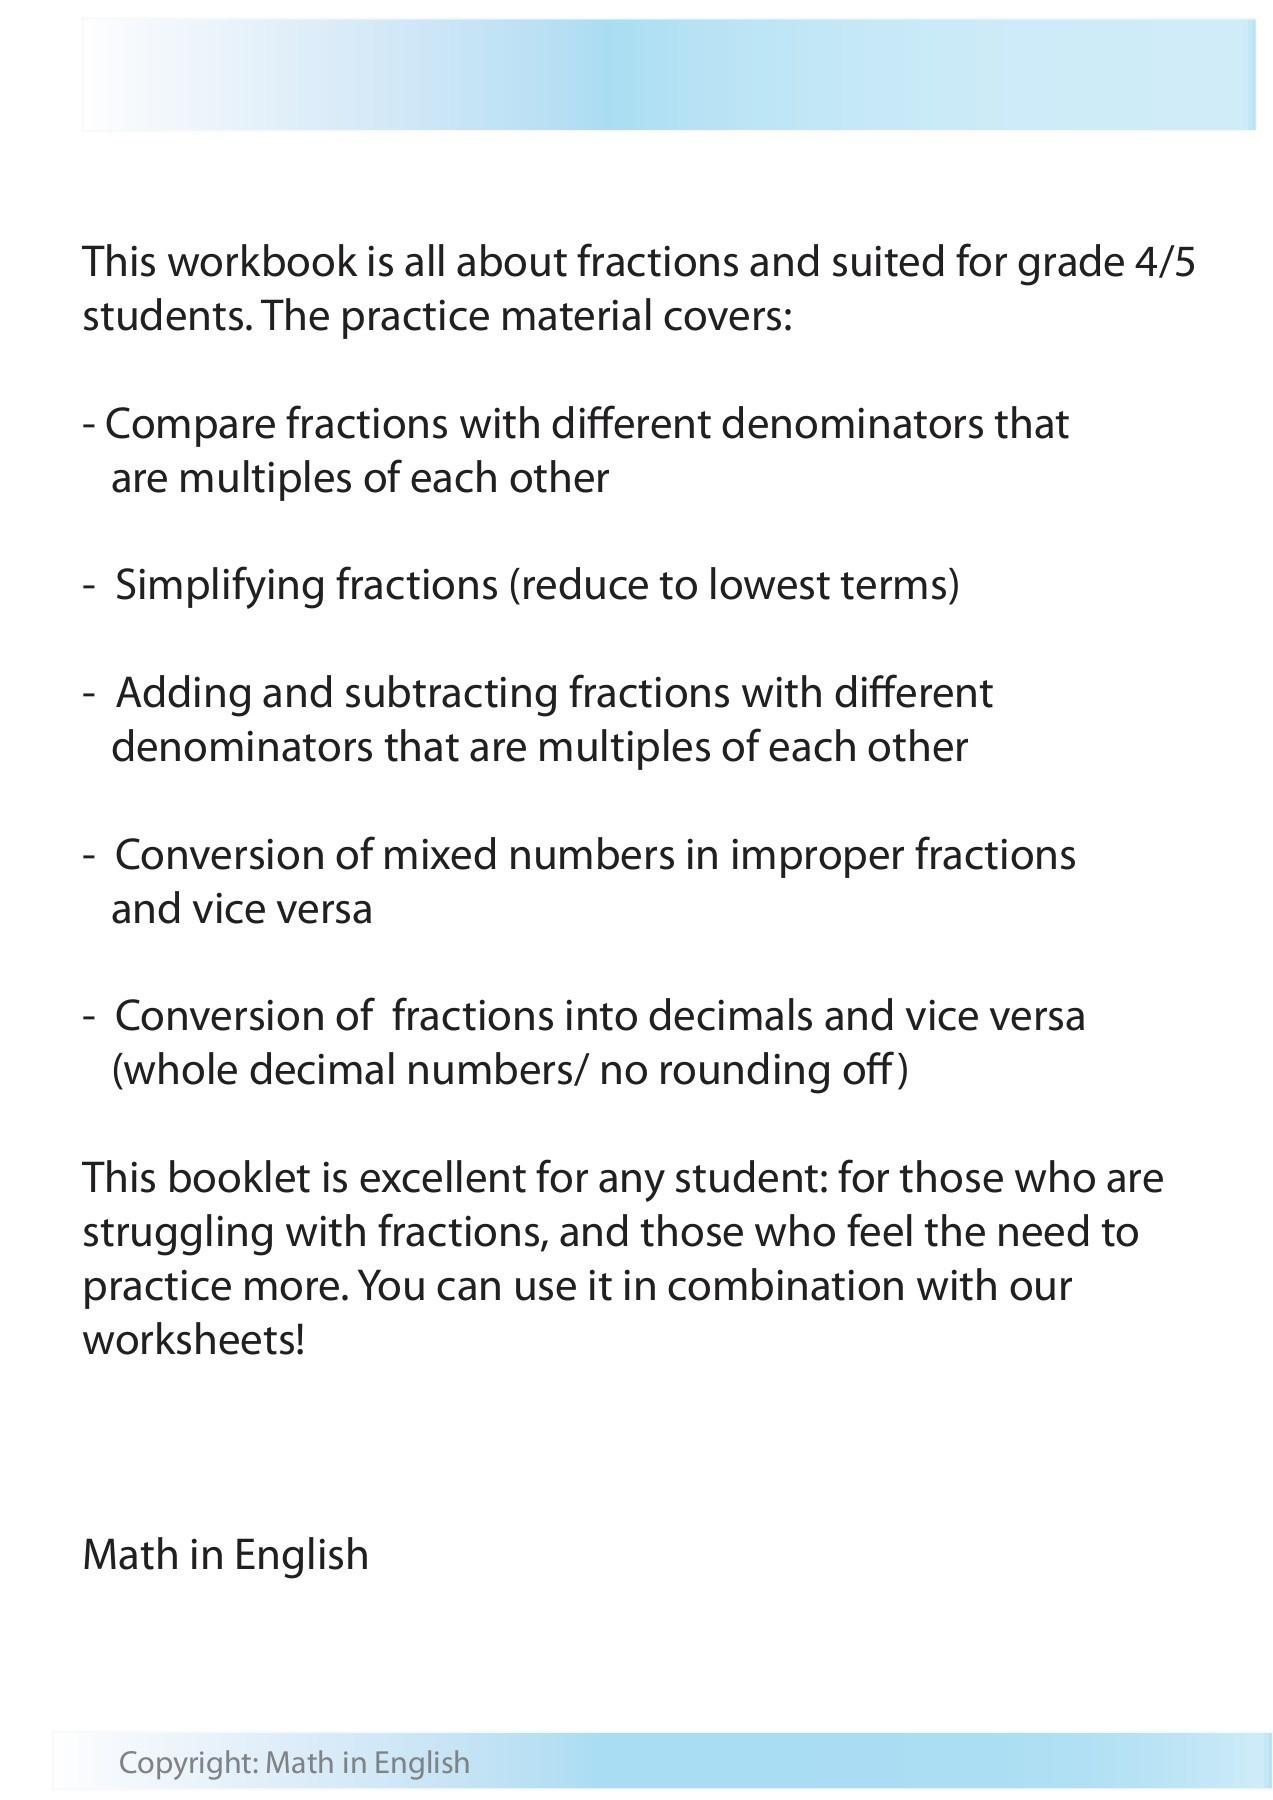 Worksheet : Free Printable Reading Level Assessment Test Homework - Free Printable Reading Level Assessment Test